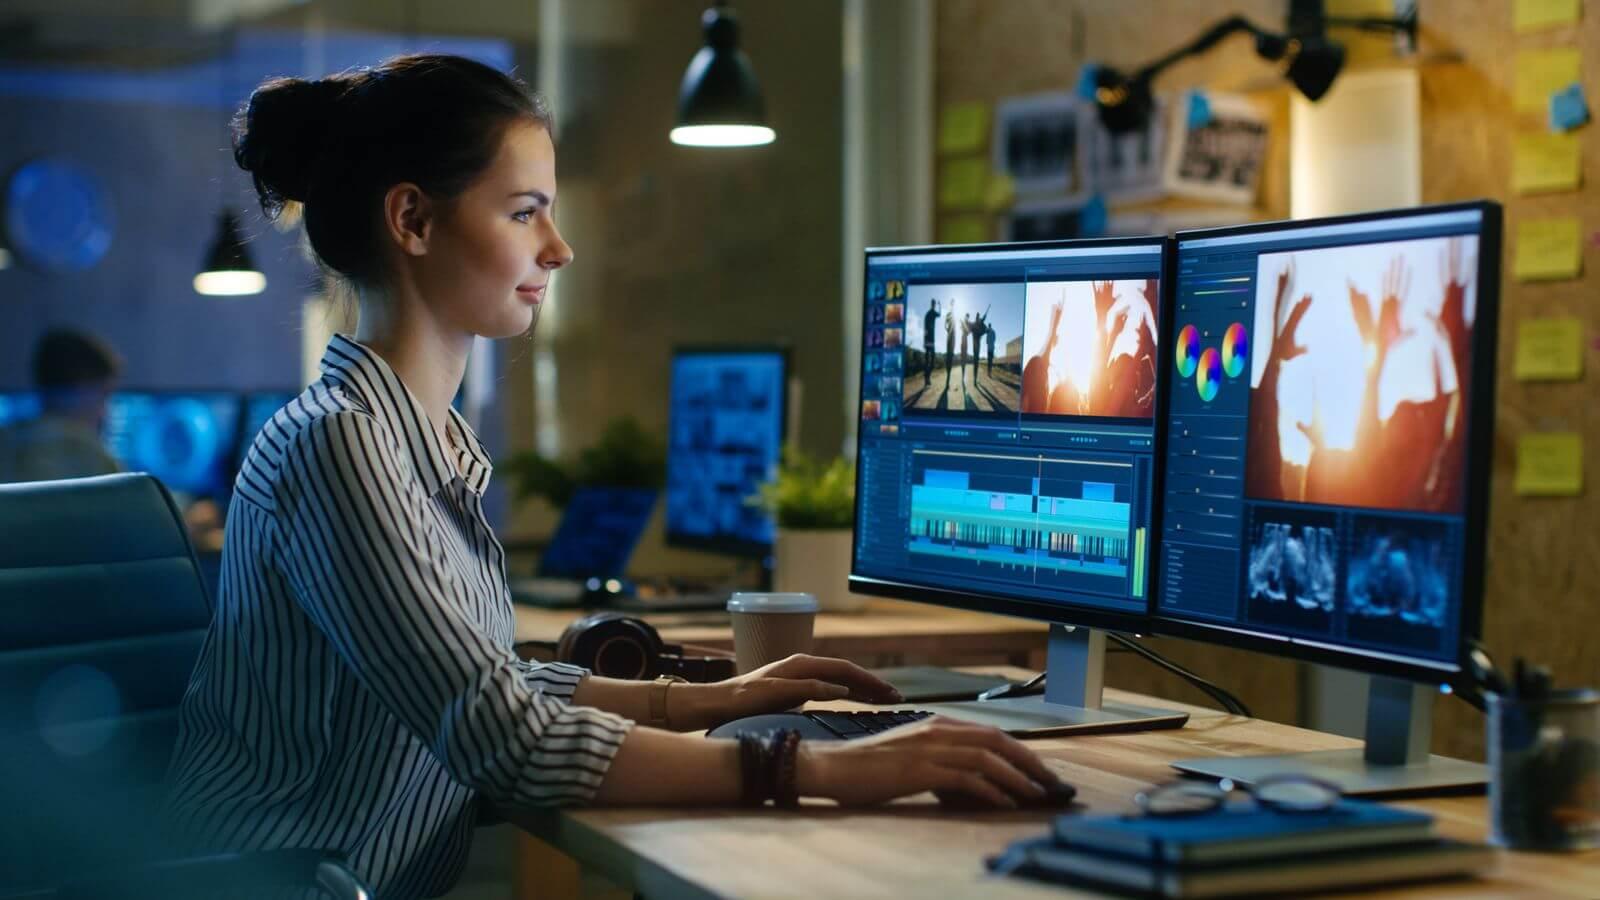 Woman creating video on desktop computer